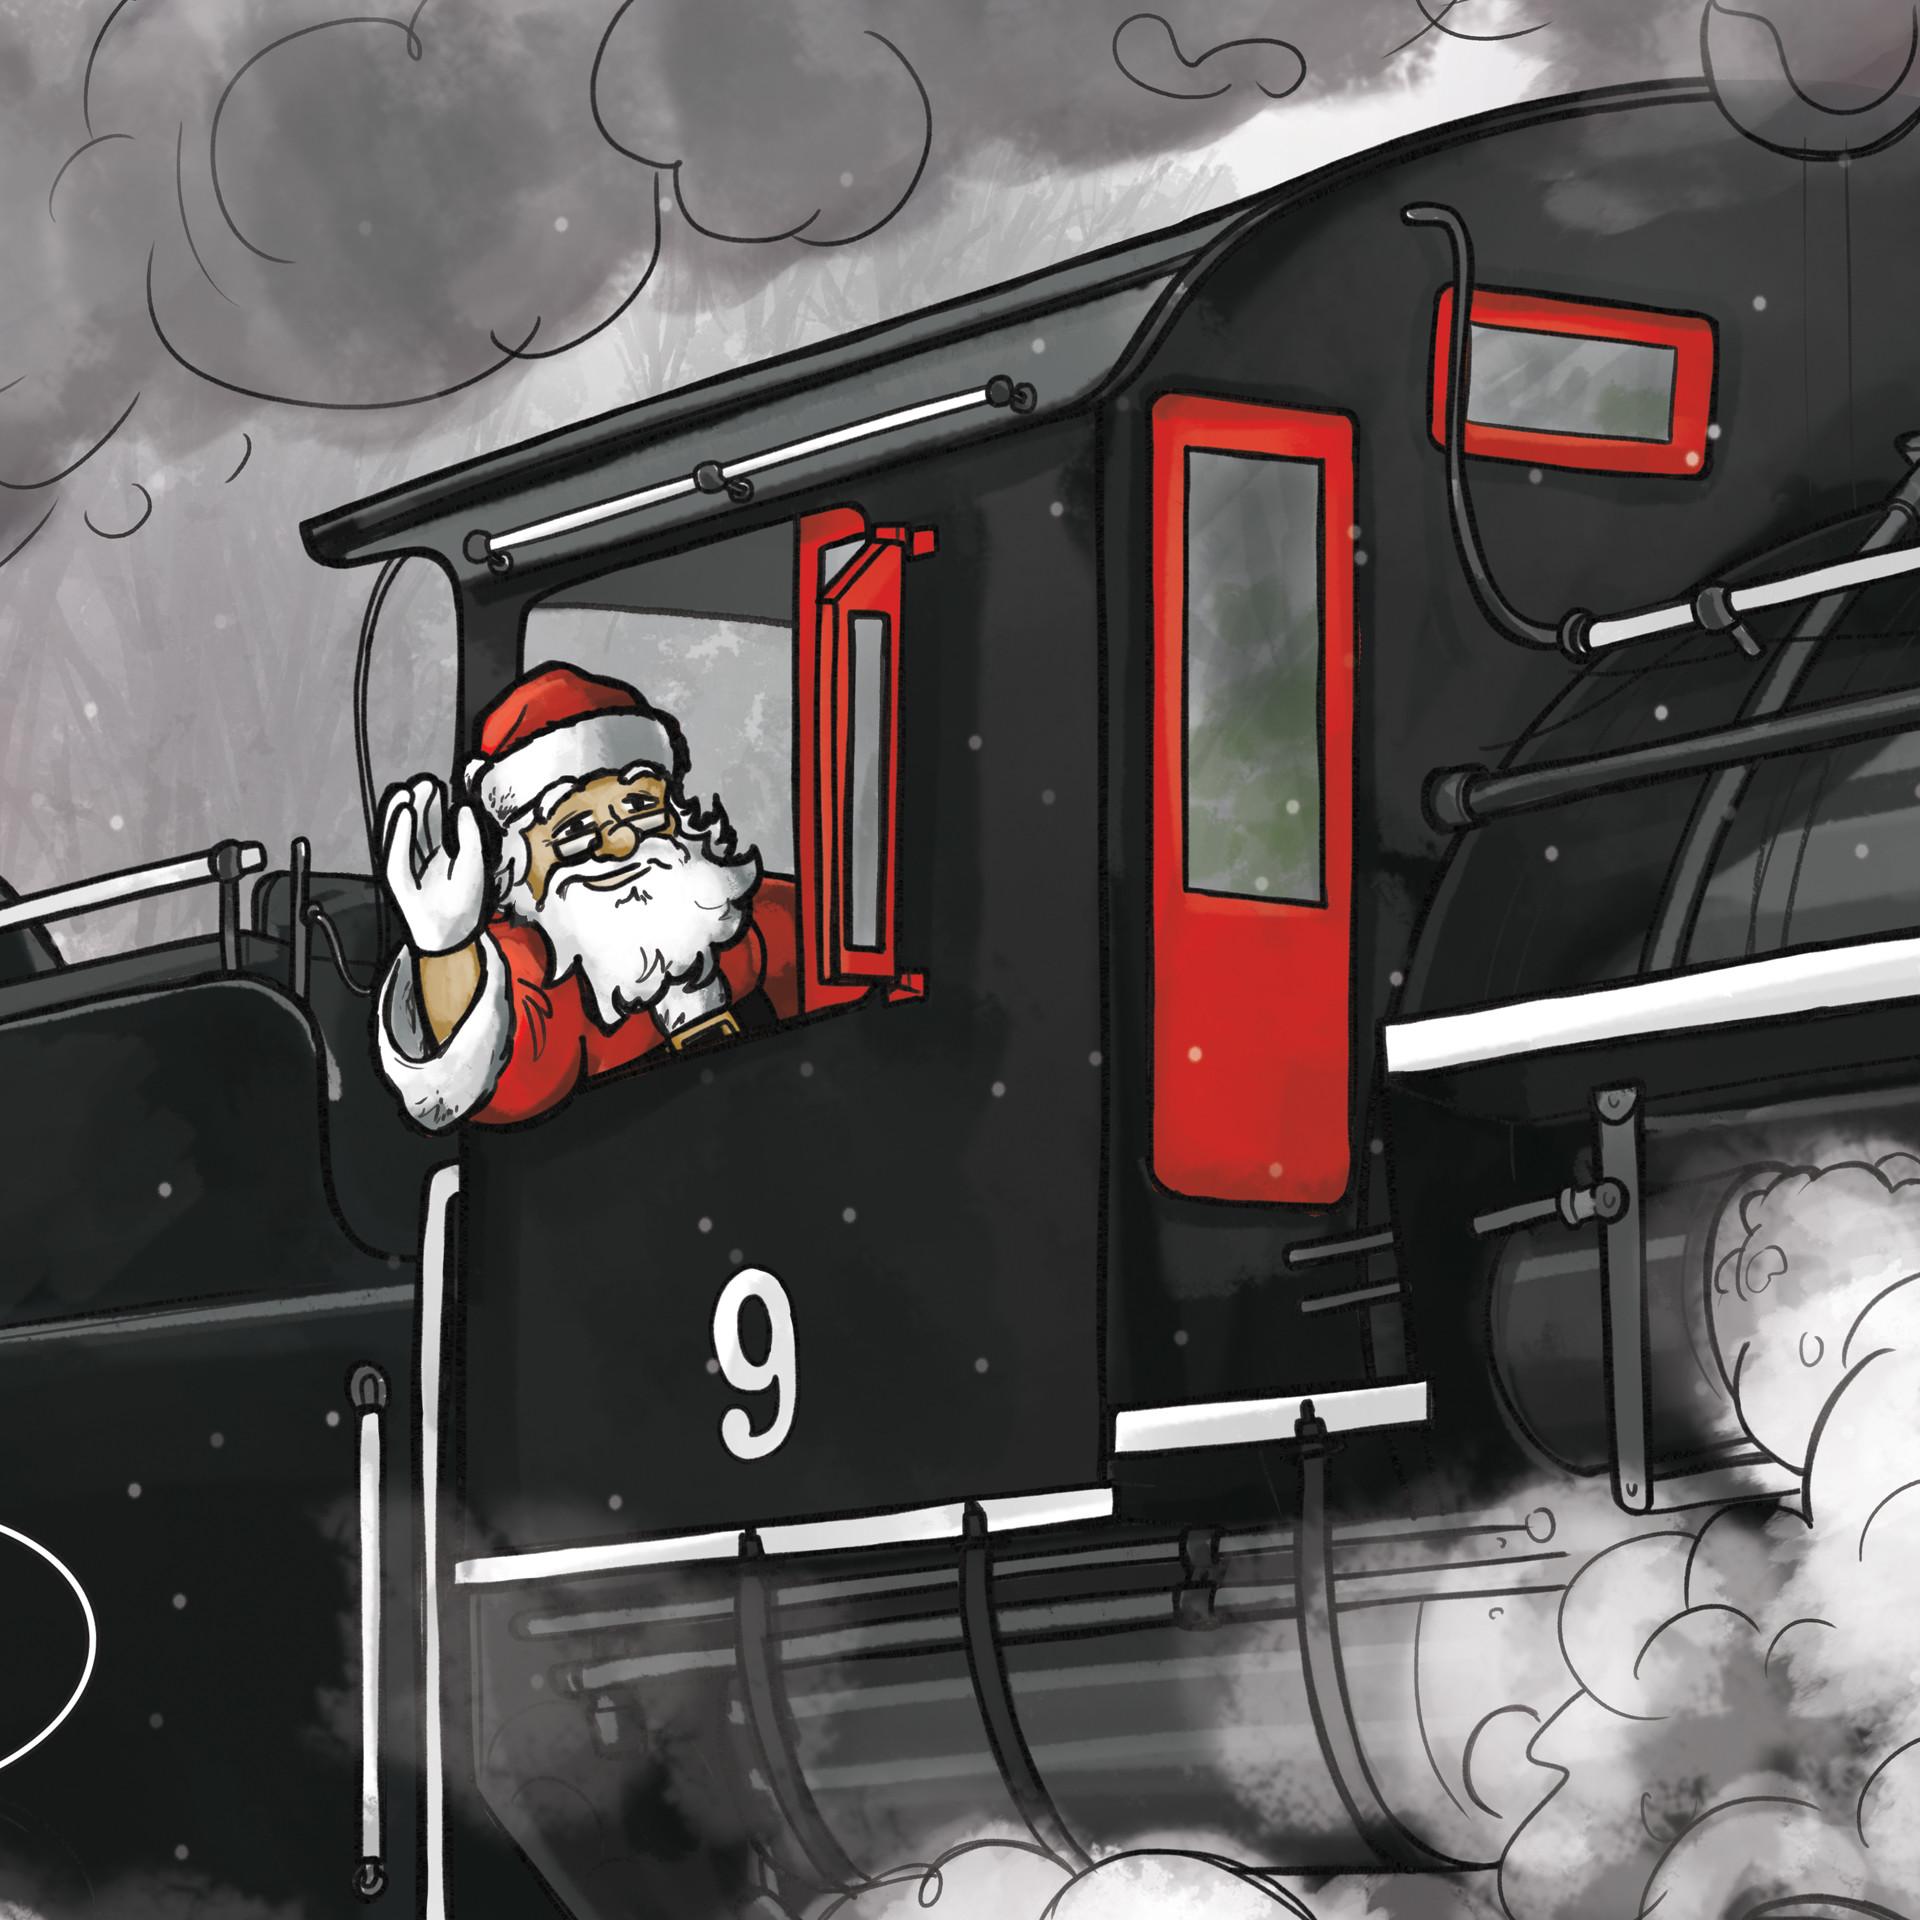 Graham moogk soulis wcr christmas book cover 2014 santa